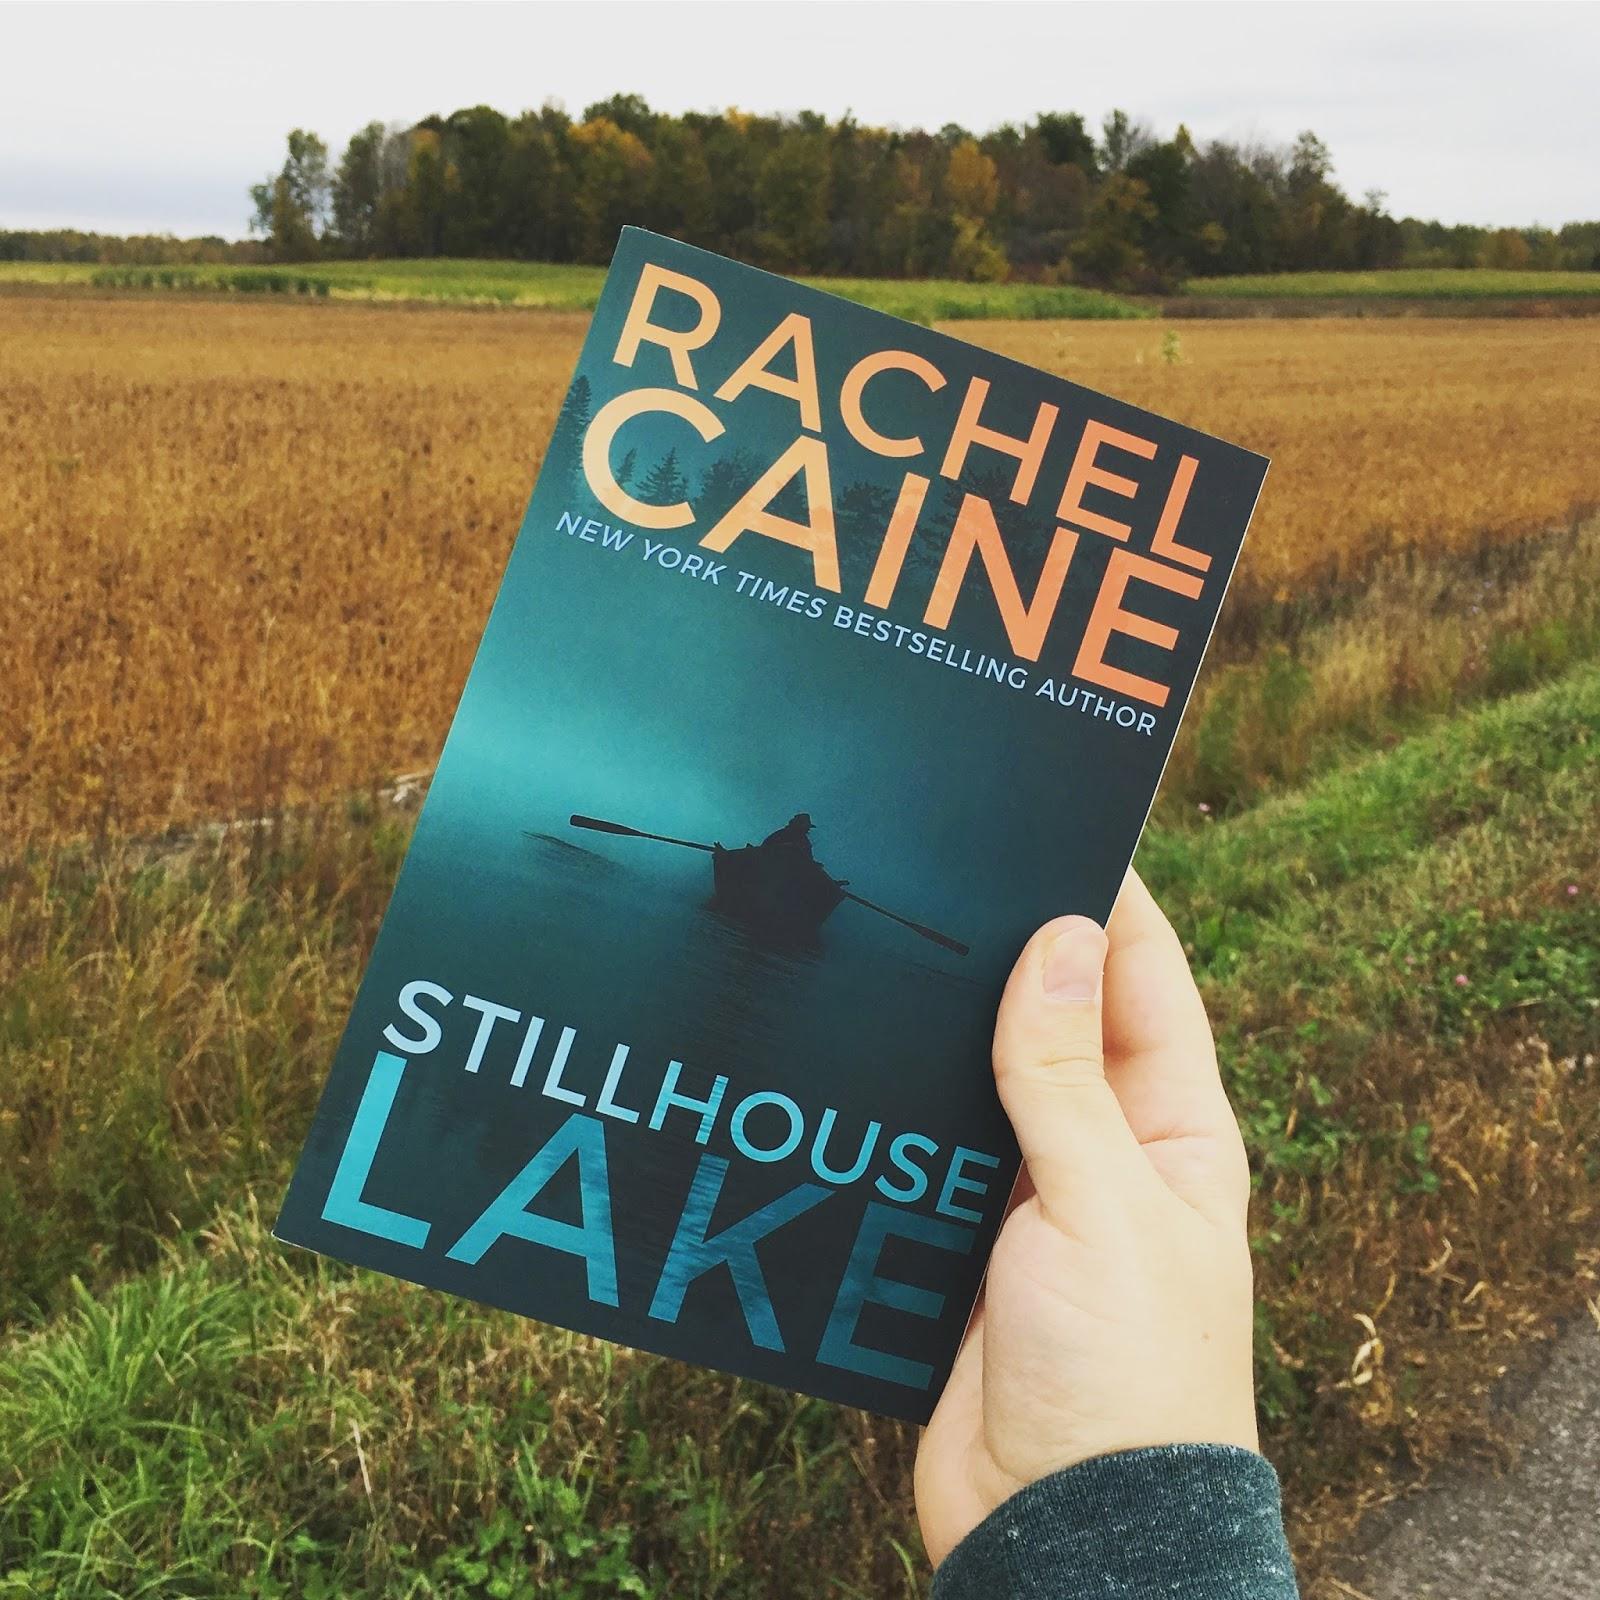 stillhouse lake stillhouse lake series book 1 english edition